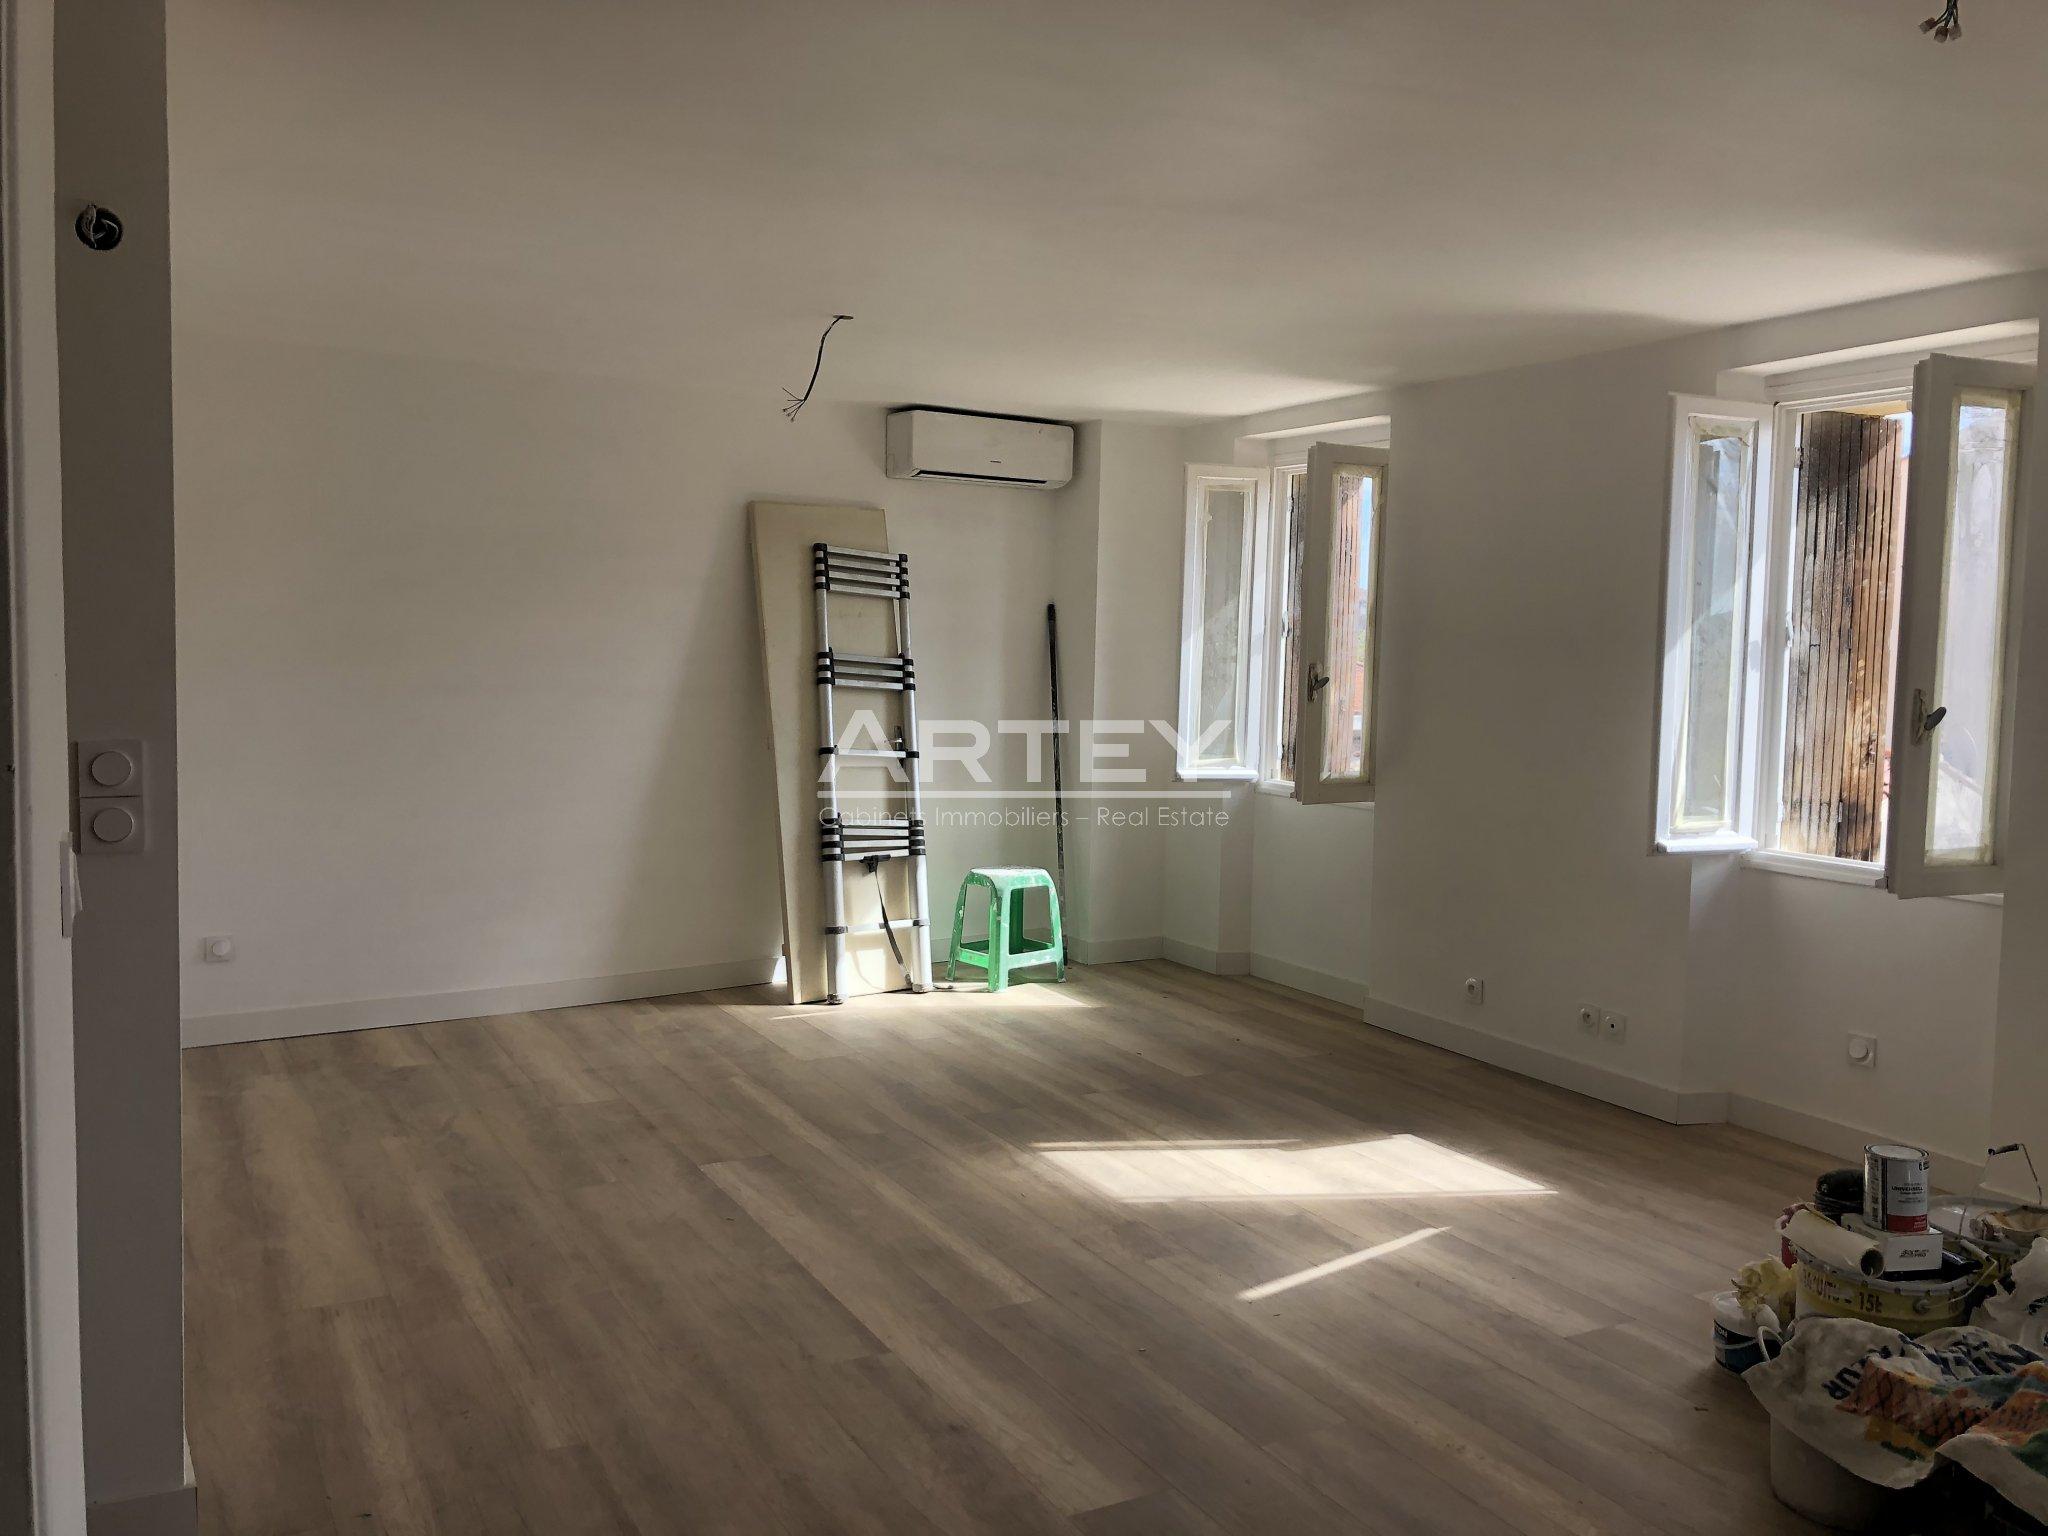 Appartement - La Crau 83260